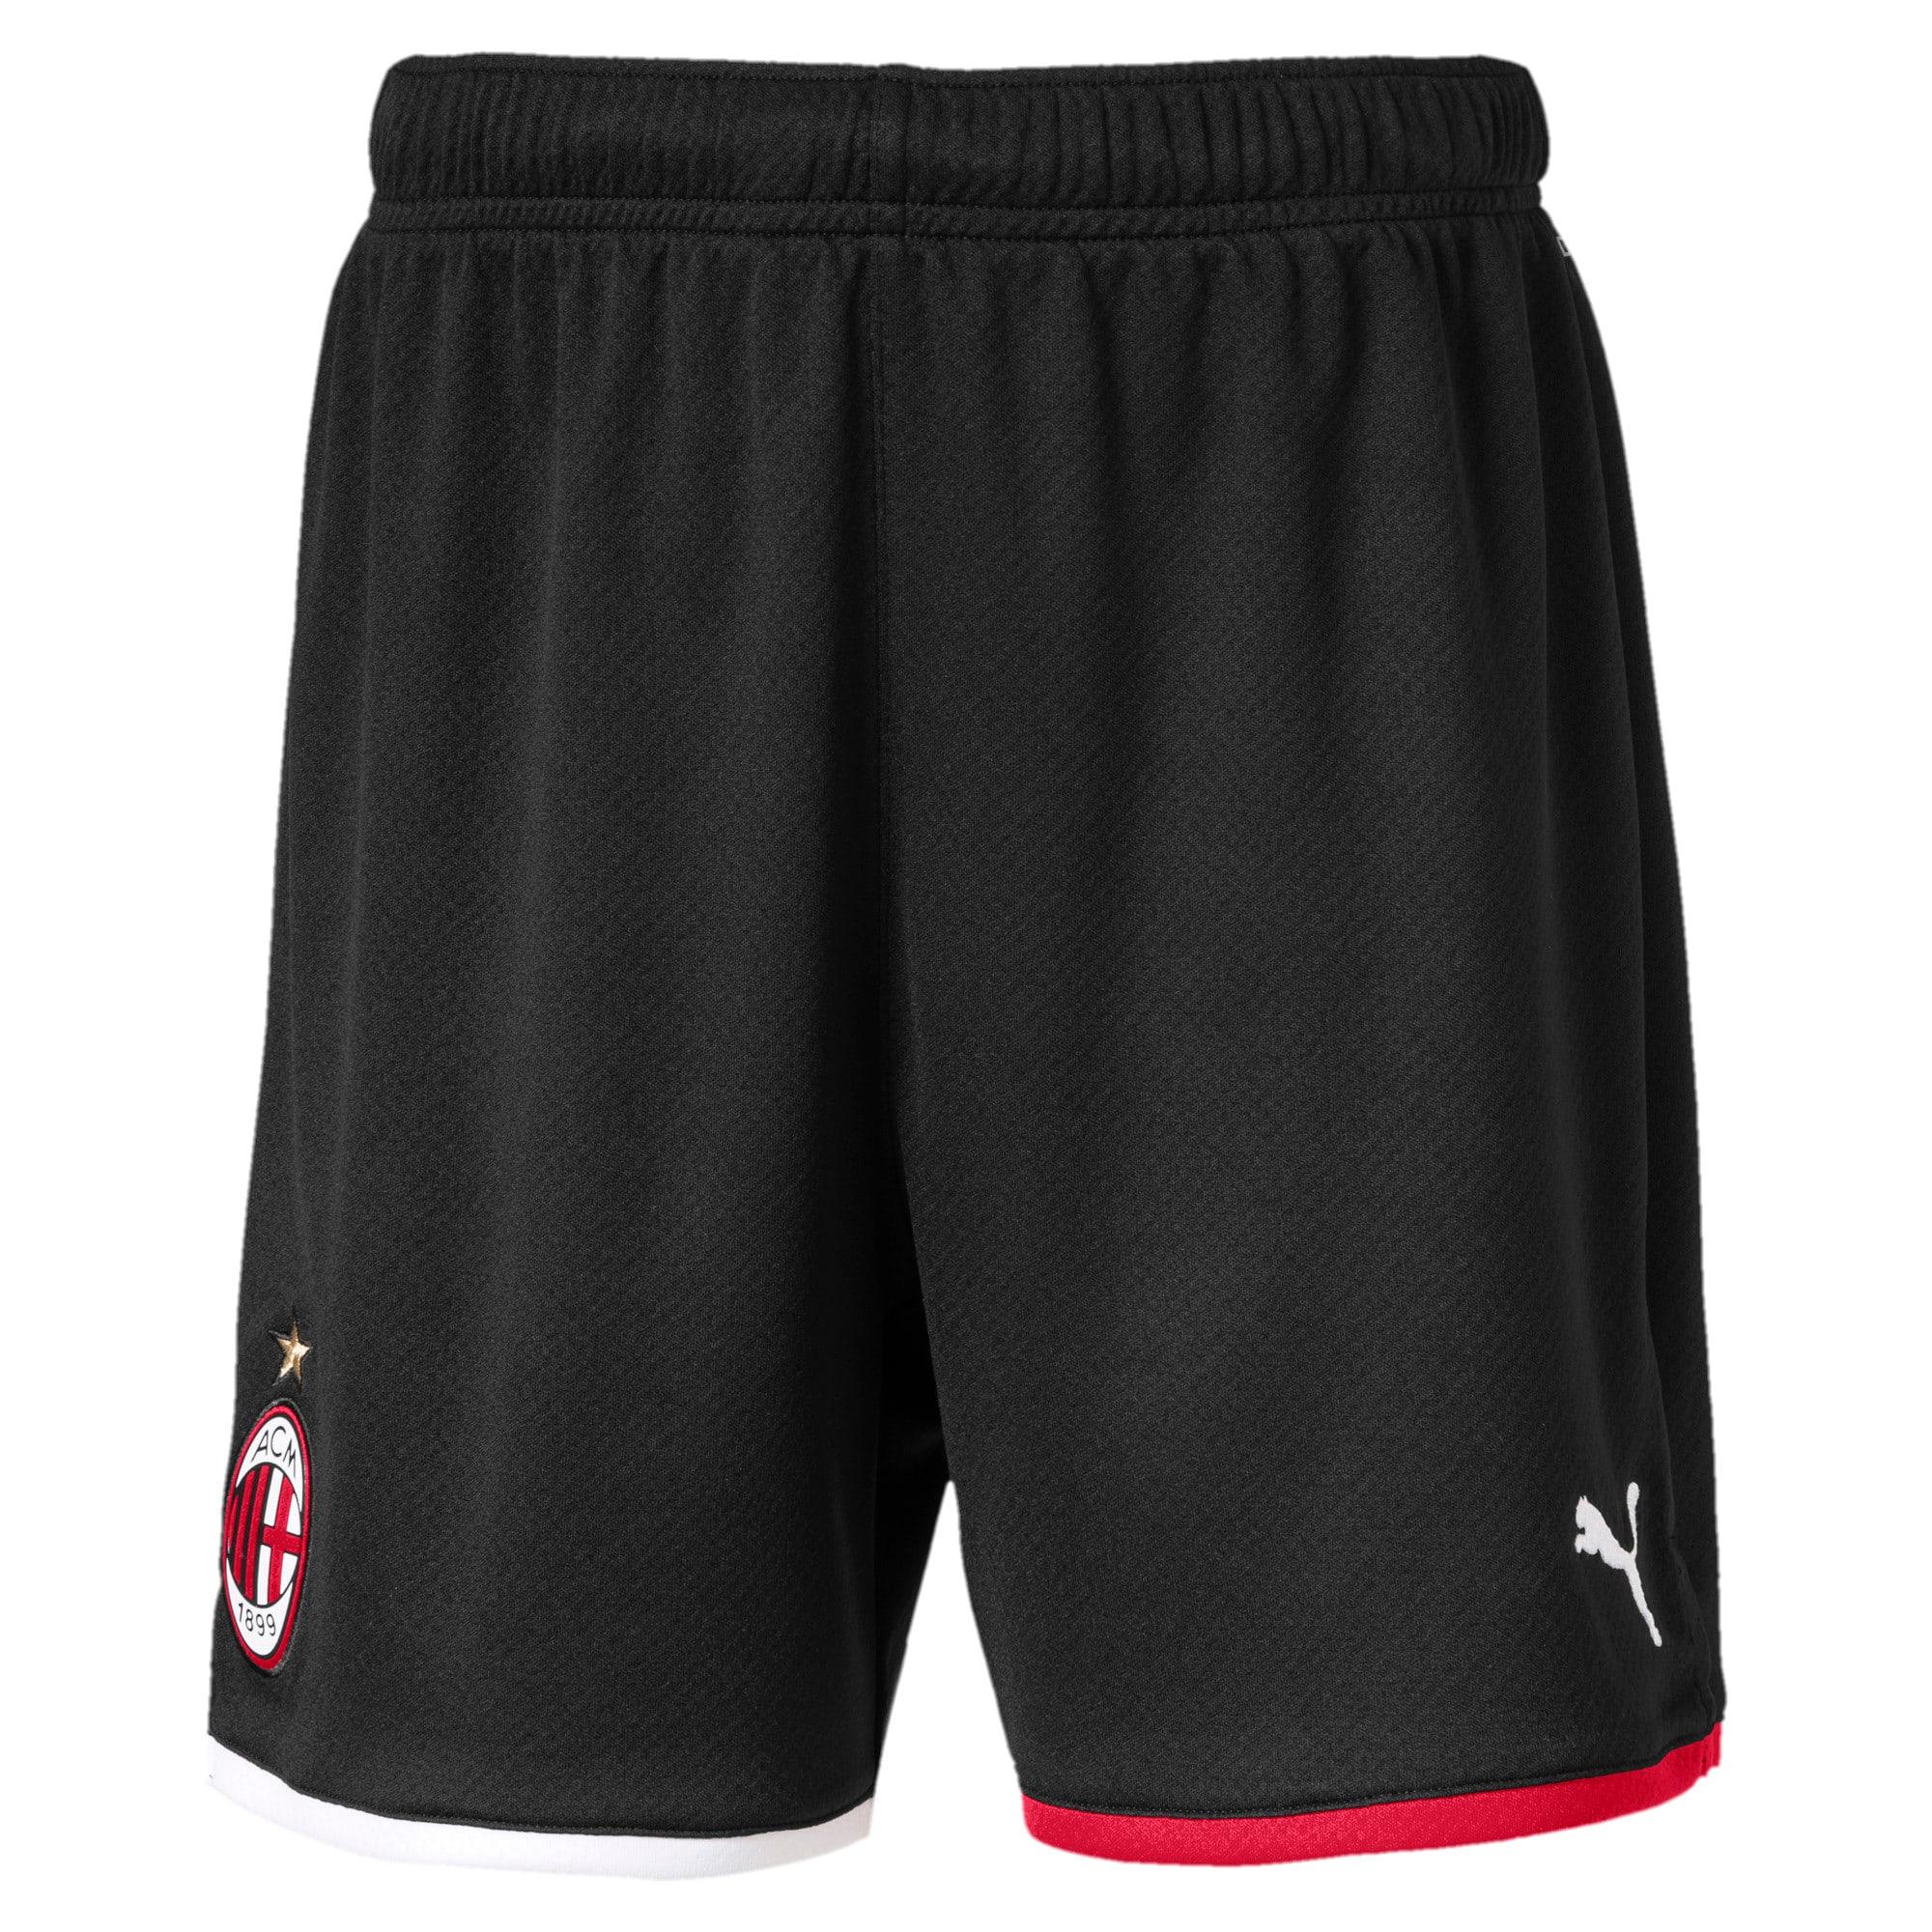 Thumbnail 1 of AC Milan Replica Kids' Shorts, Puma Black-Tango Red, medium